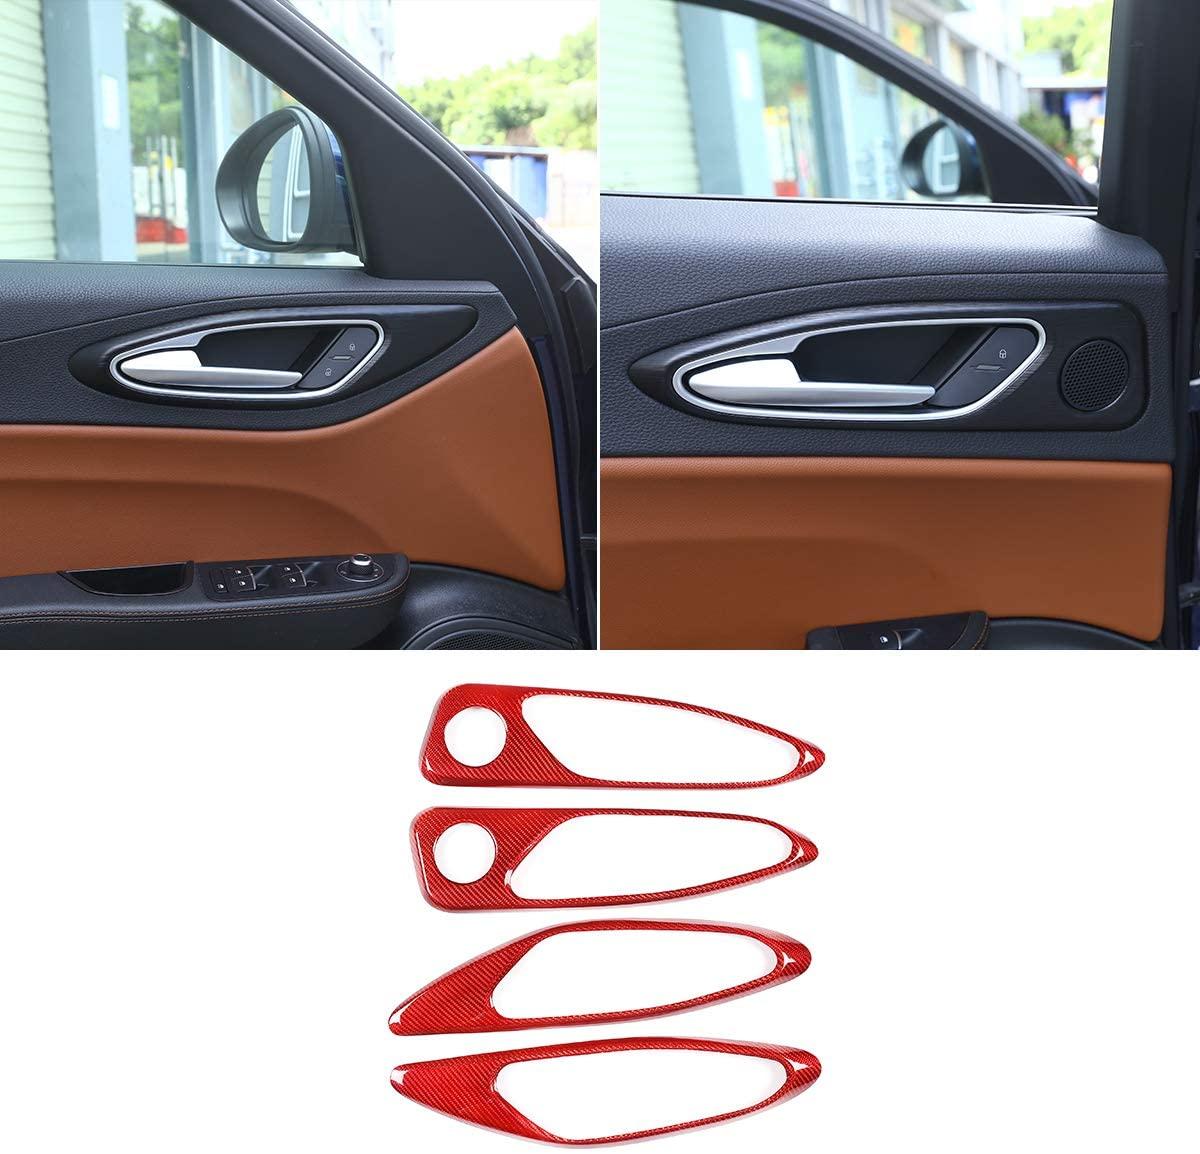 CHEYA 100% Real Carbon Fiber Car Interior Door Handle Frame Cover Trim Sticker for Alfa Romeo Giulia 2017-2020 Auto Accessories (Red)